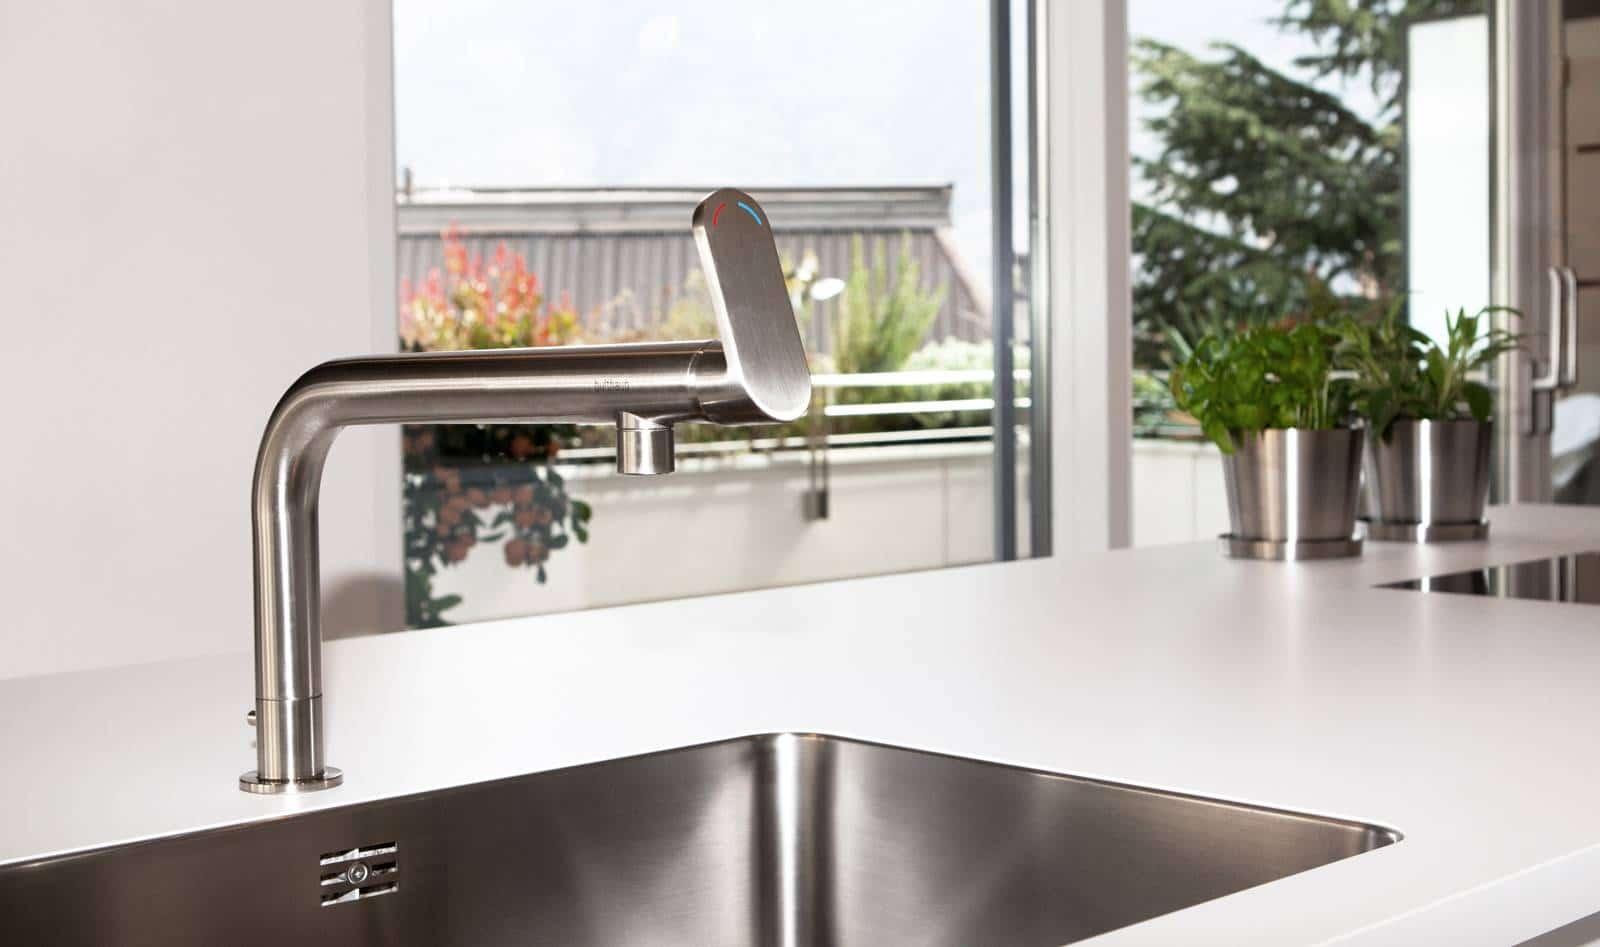 Grifer a moderna para cocina construye hogar for Construye hogar